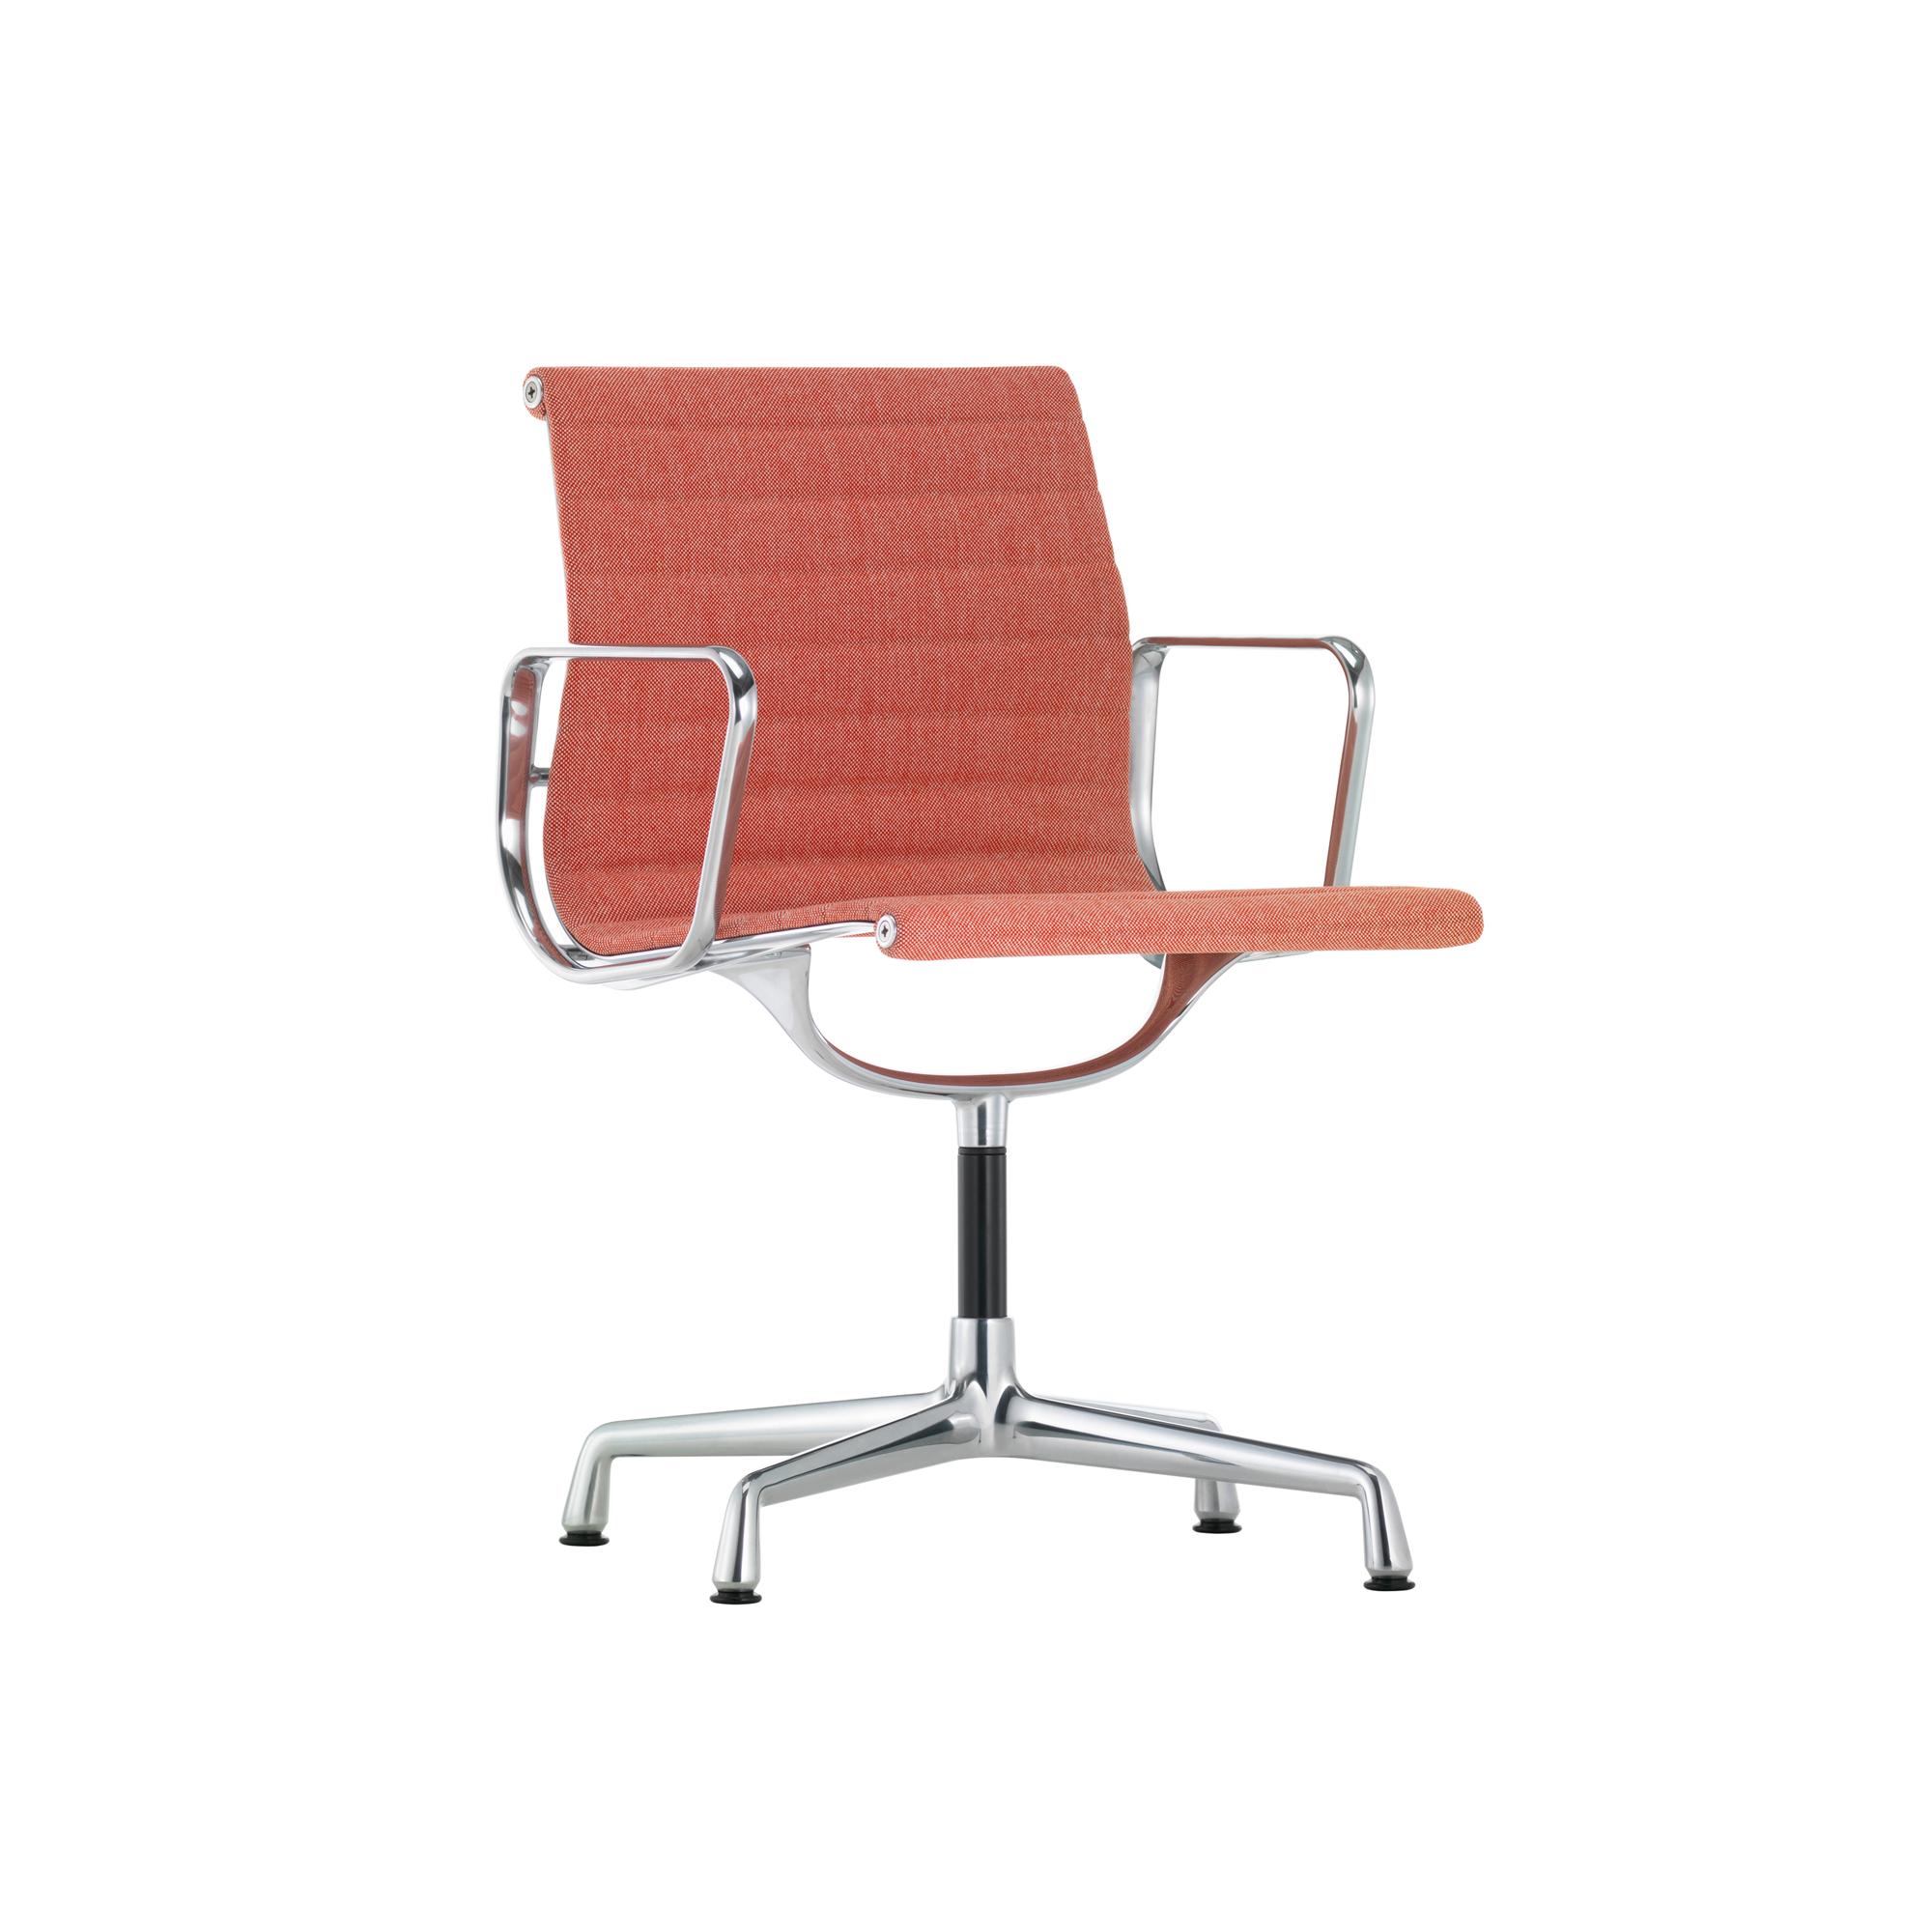 vitra stuhl aluminium chair ea 104 in netzgewebe stoff oder leder designikonen designm bel shop. Black Bedroom Furniture Sets. Home Design Ideas